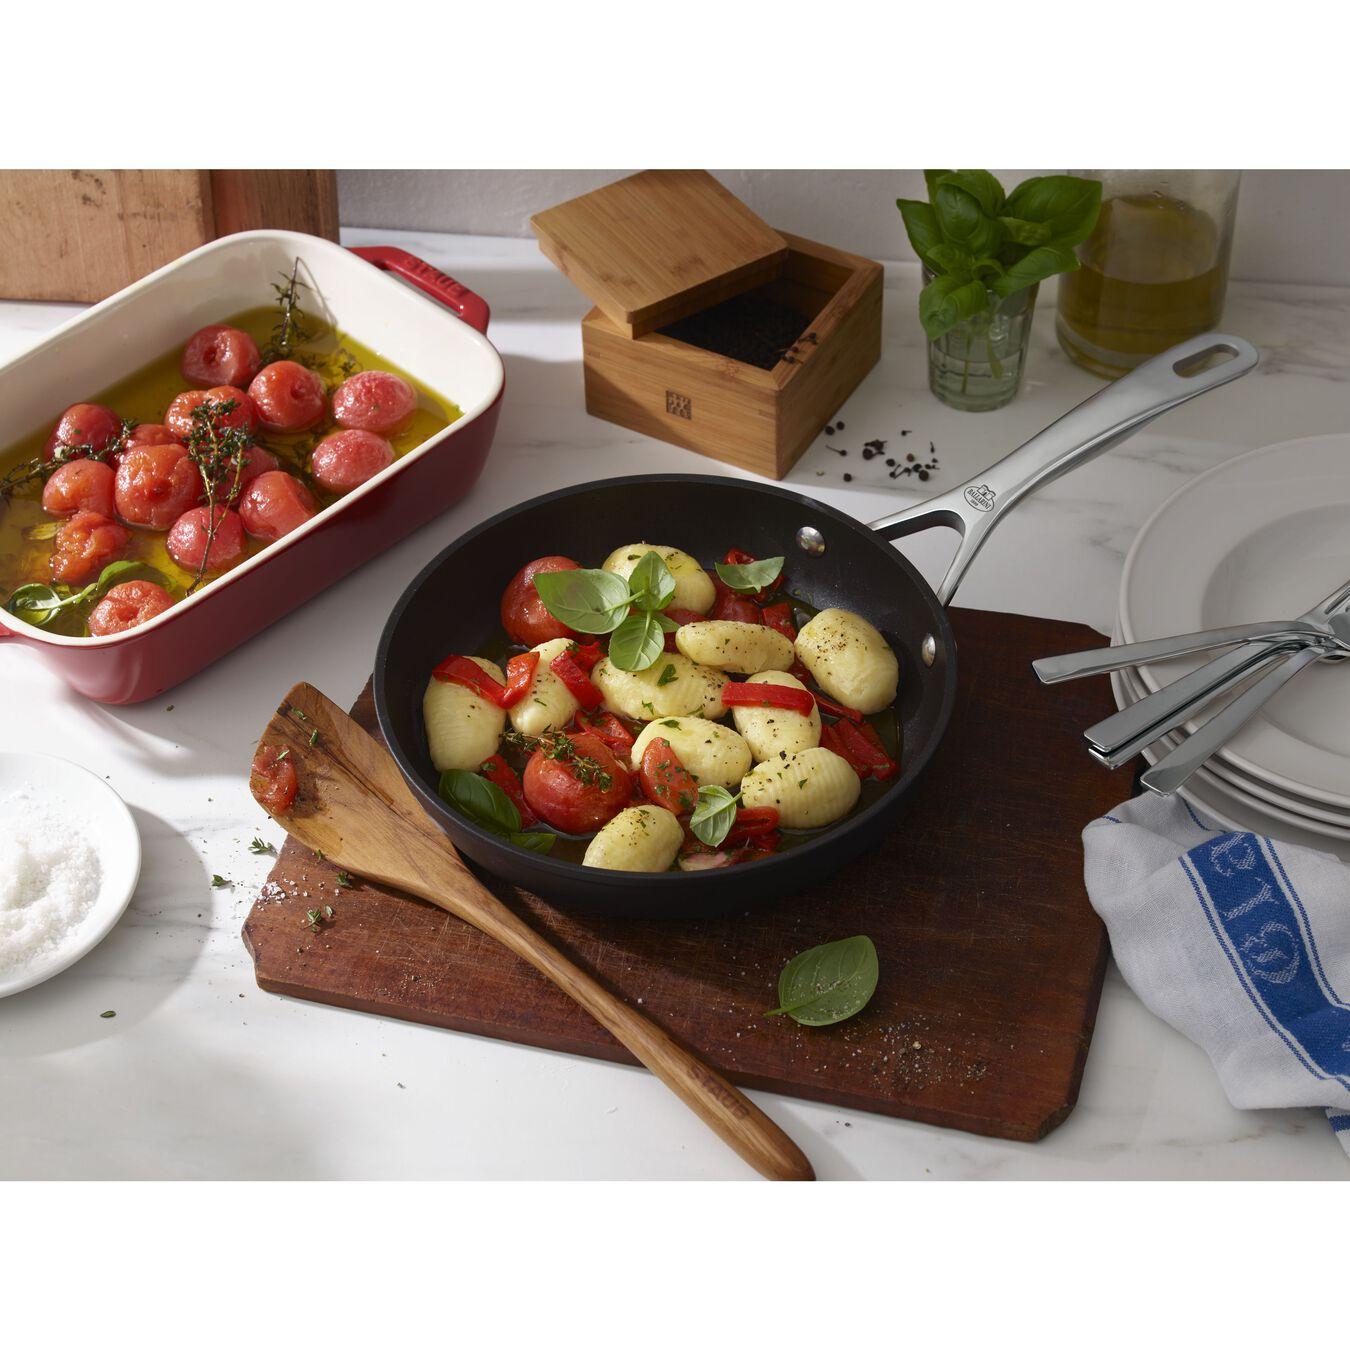 26 cm / 10 inch Frying pan,,large 4